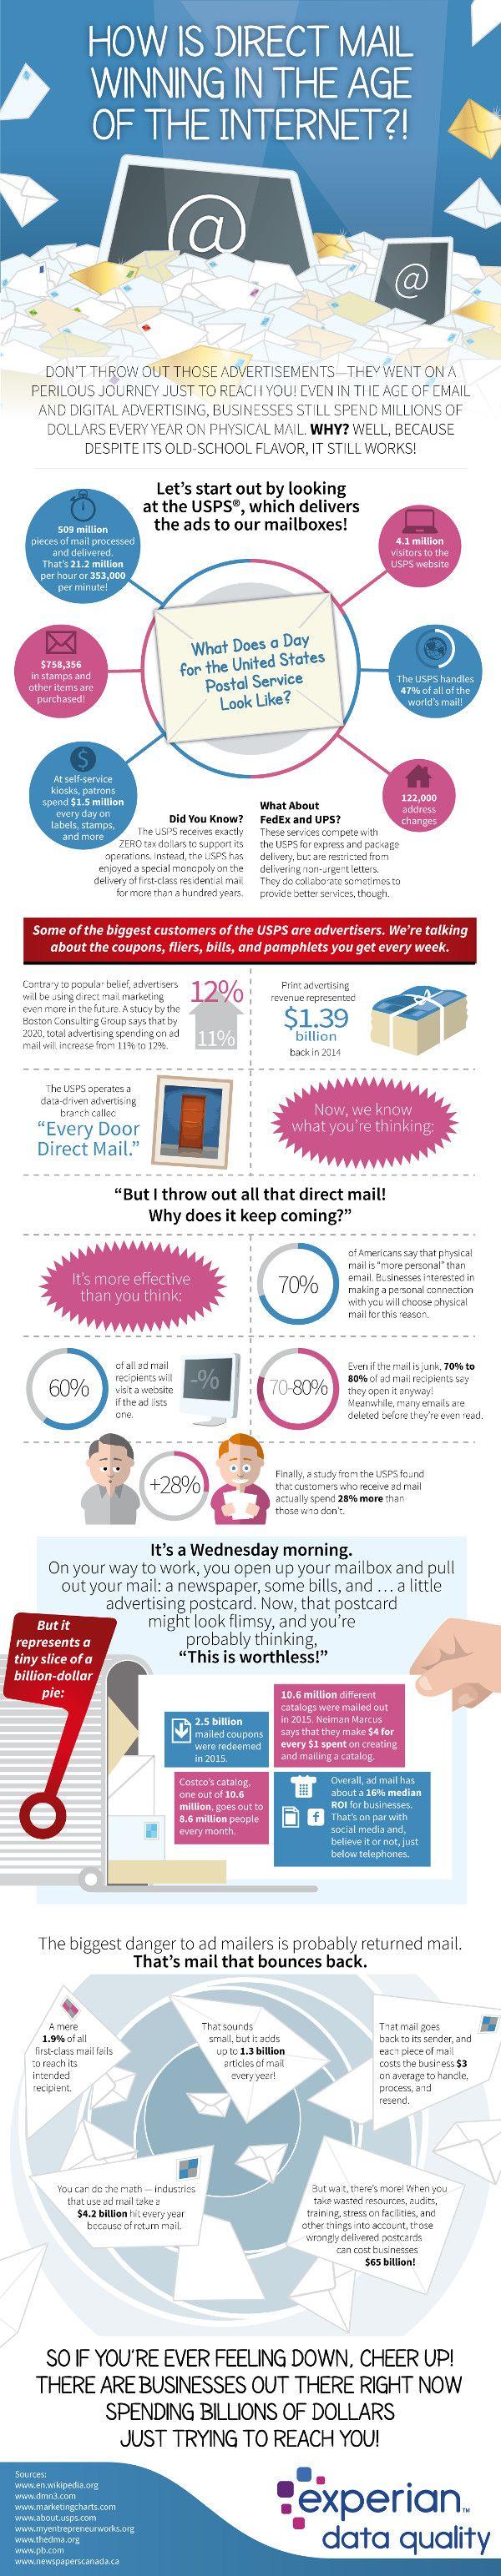 Best 20+ Mail marketing ideas on Pinterest